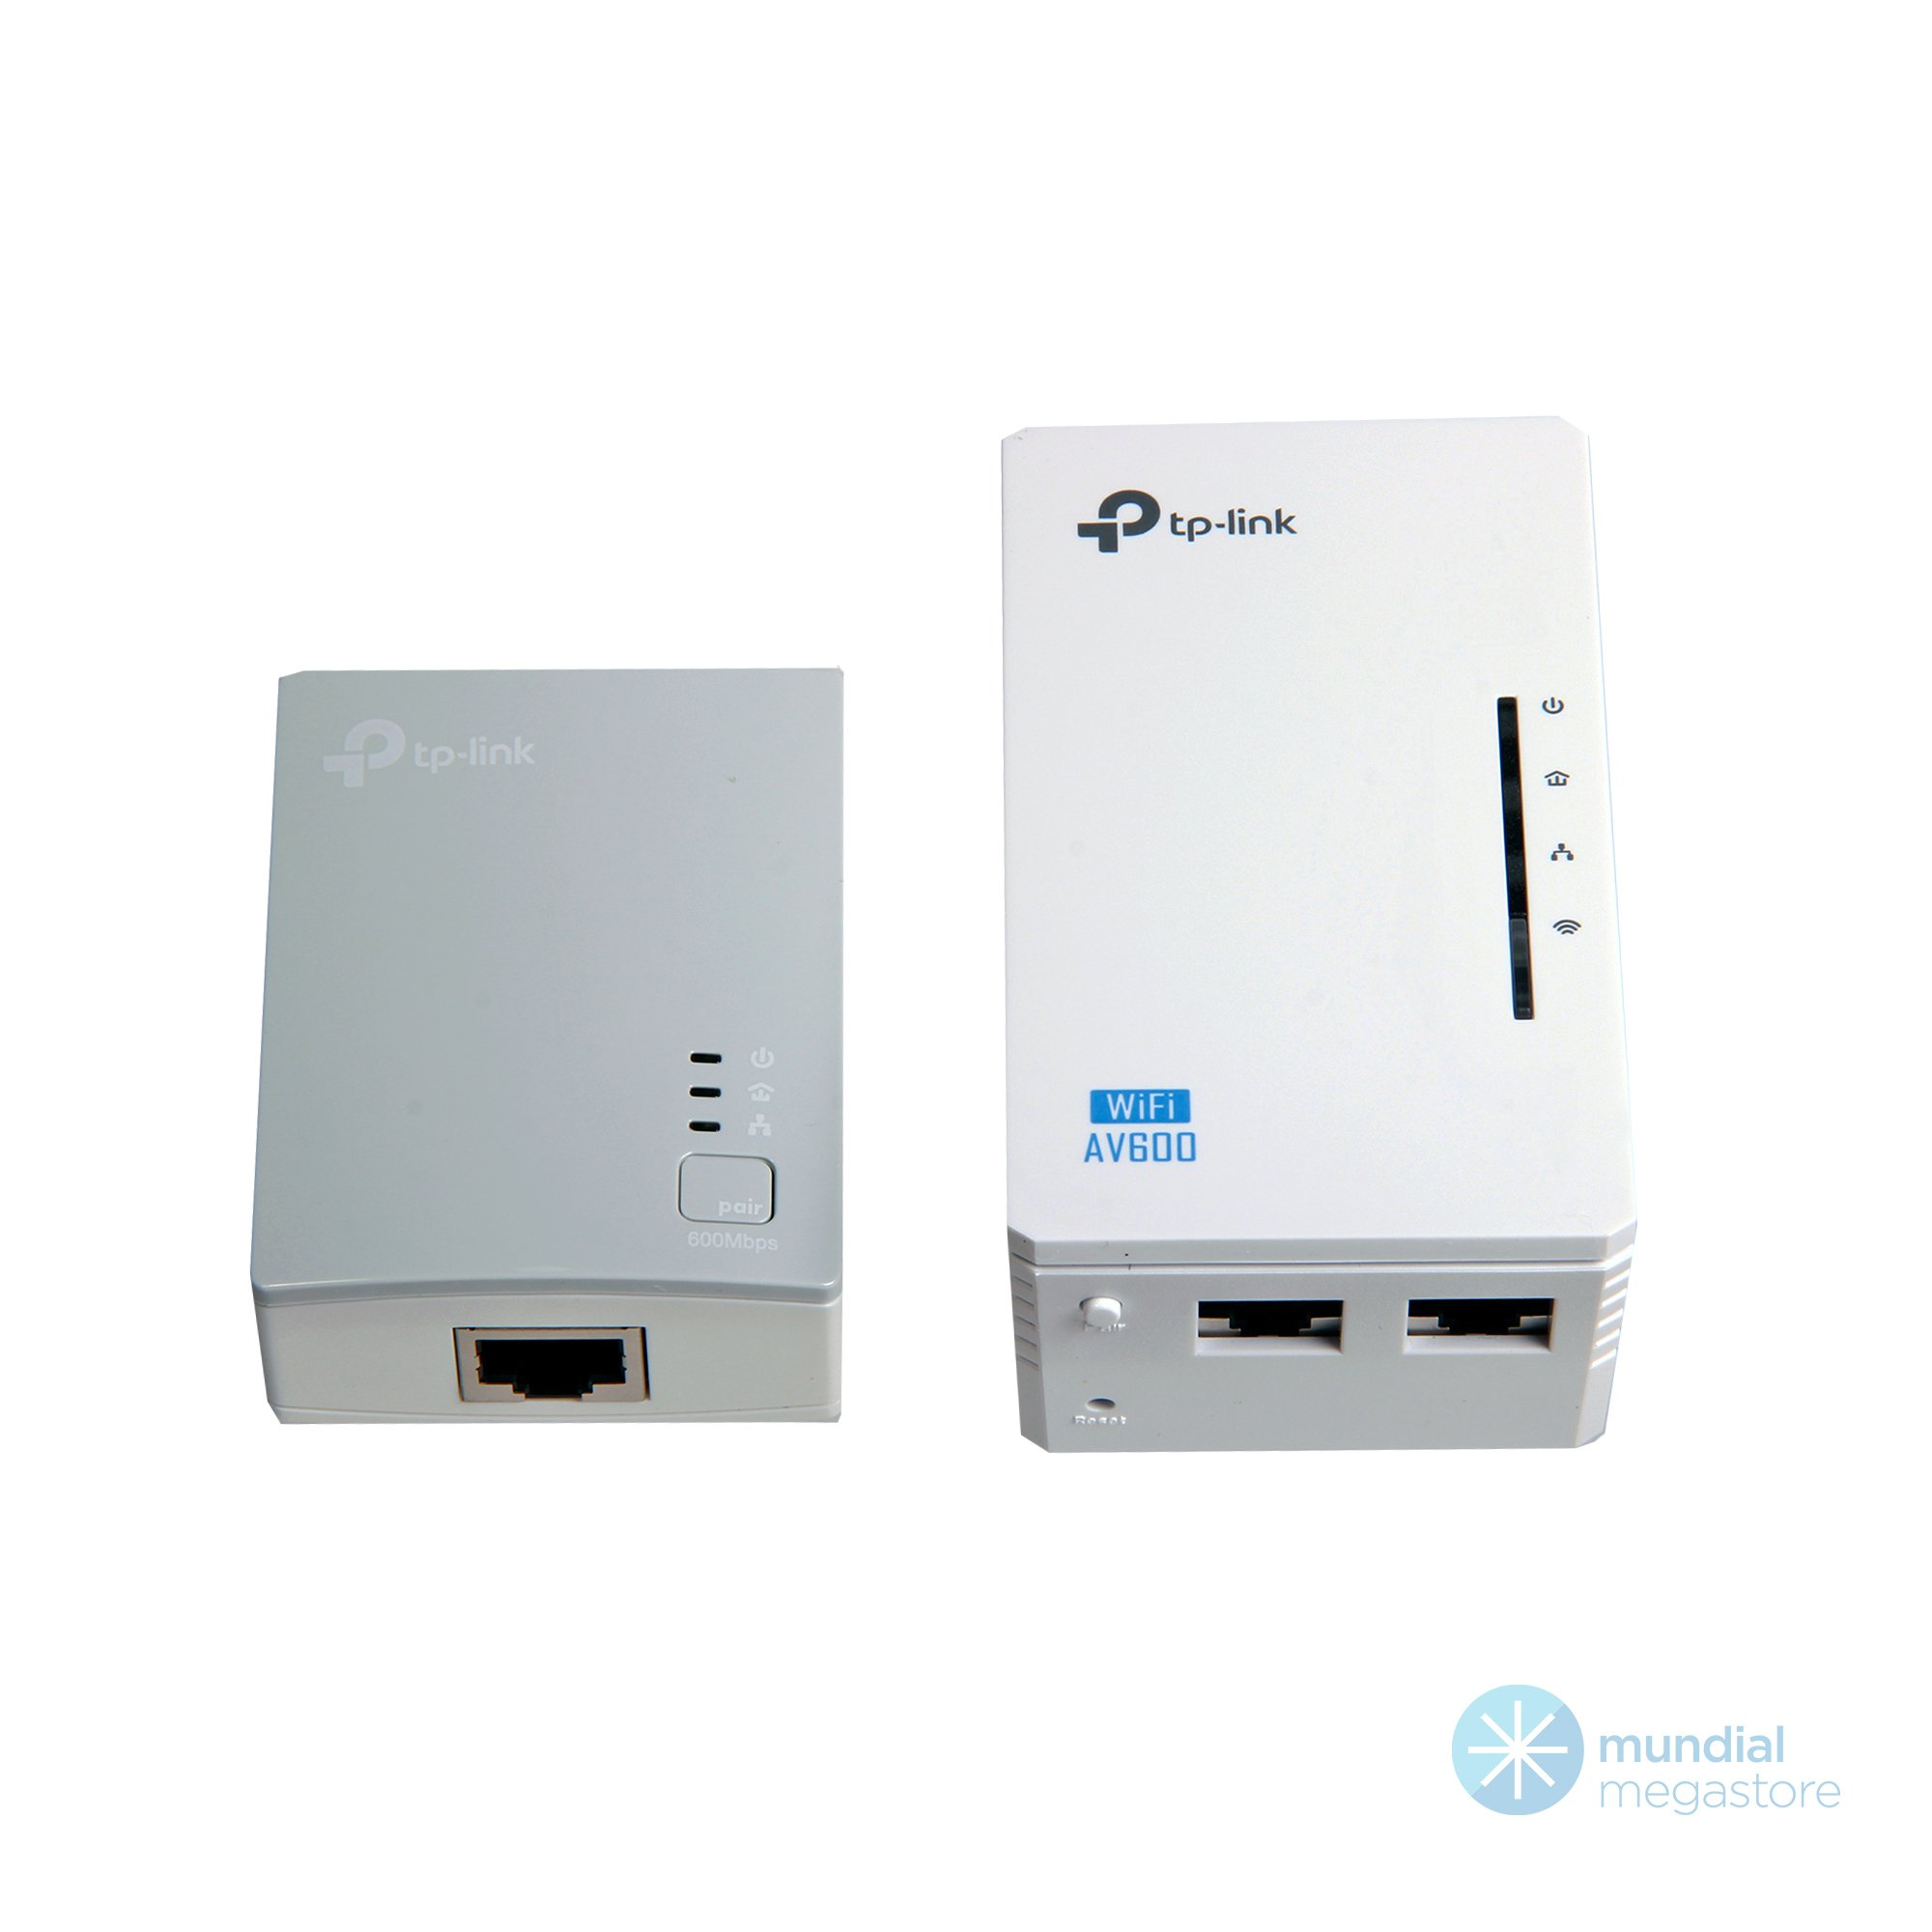 wireless extensor de alcance tp link tl wpa4220 kit powerline av500mbps 43777 2000 195992 1